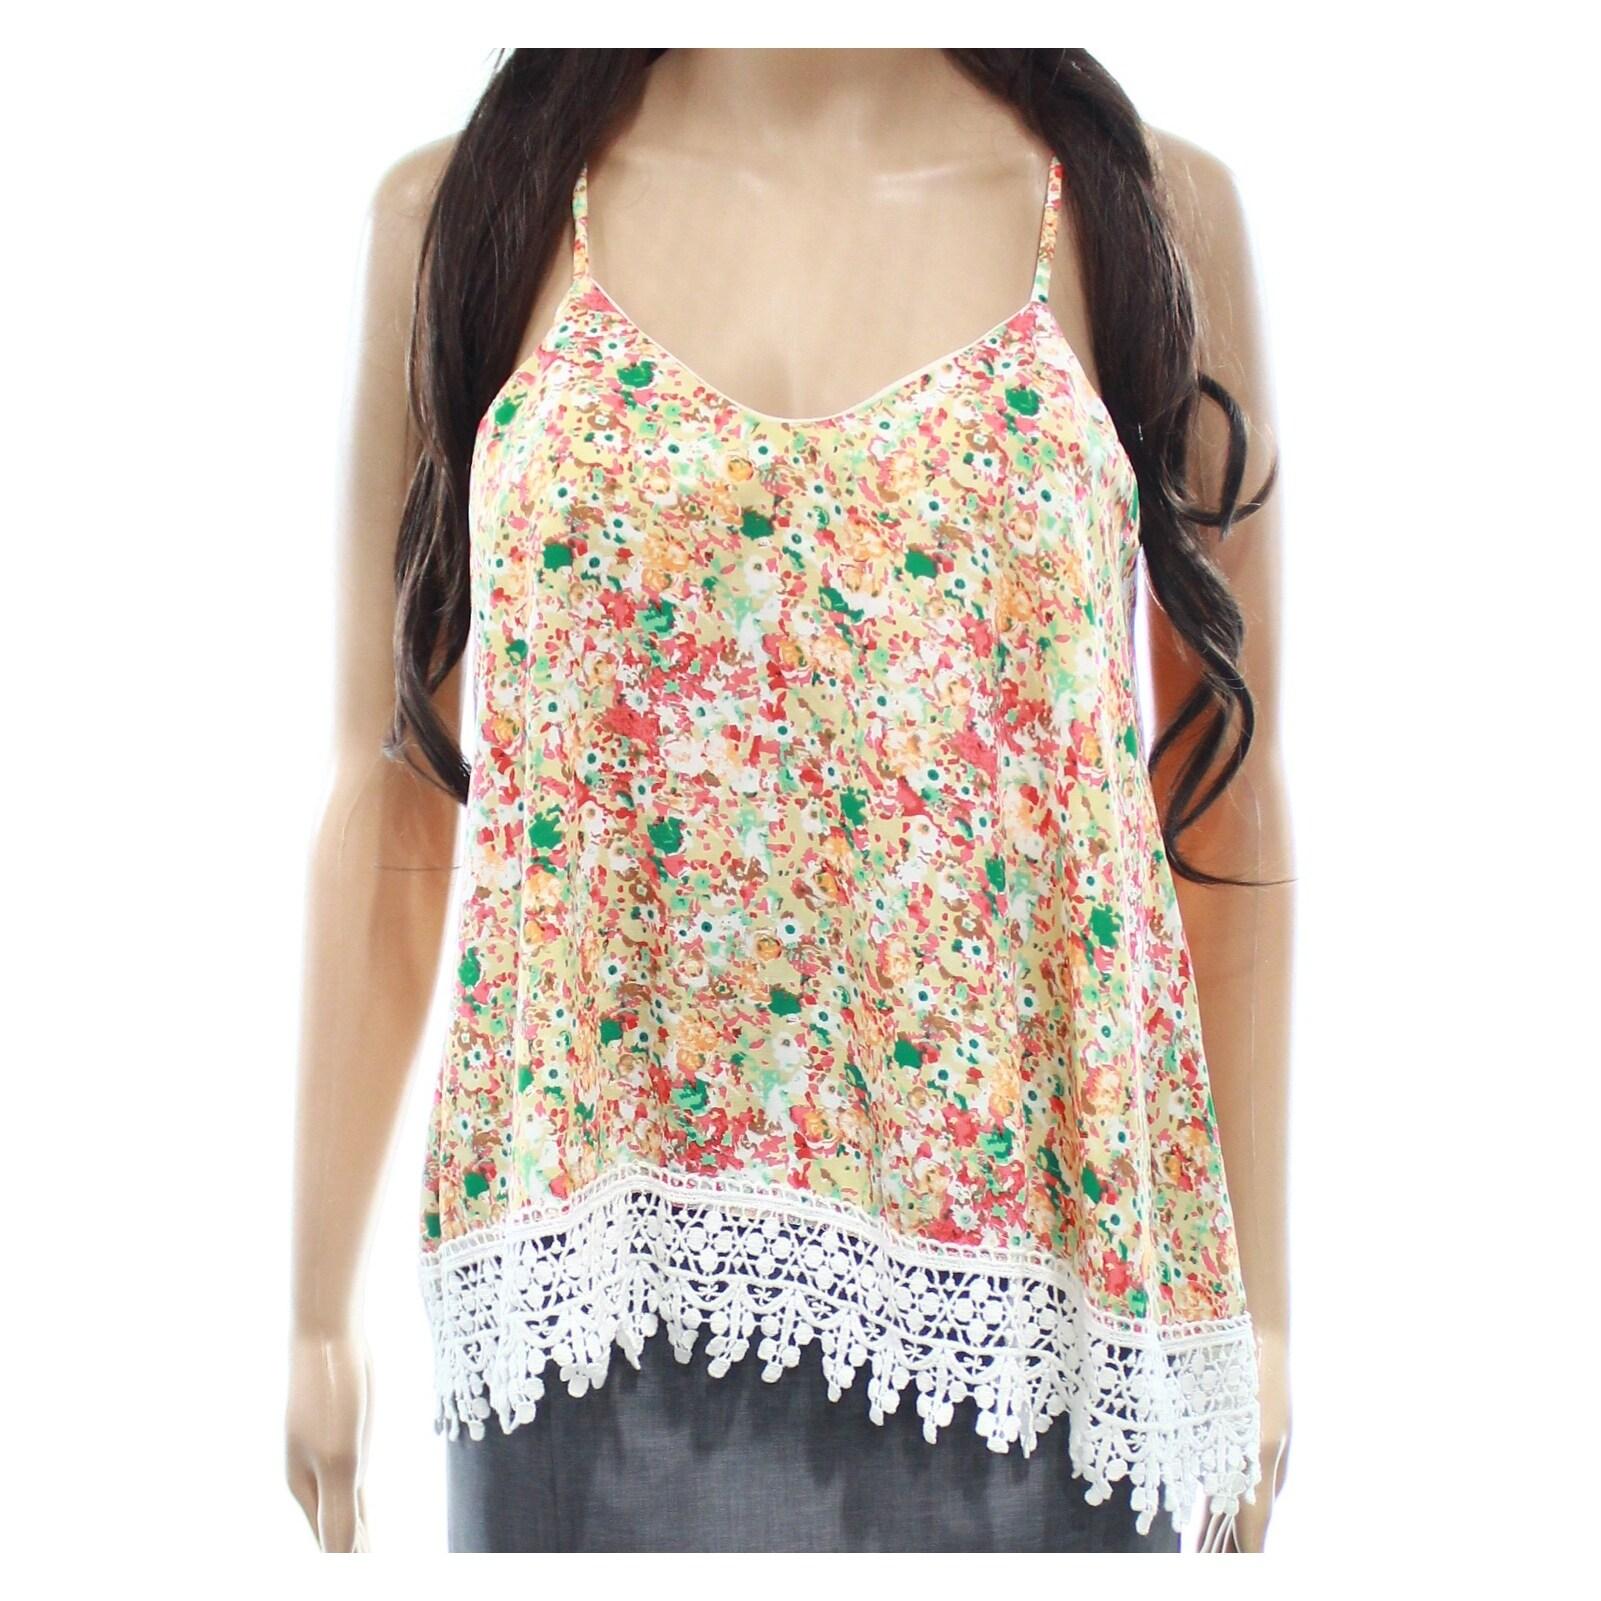 Shop Moa Moa New Orange Womens Size Small S Floral Crochet Hem Cami